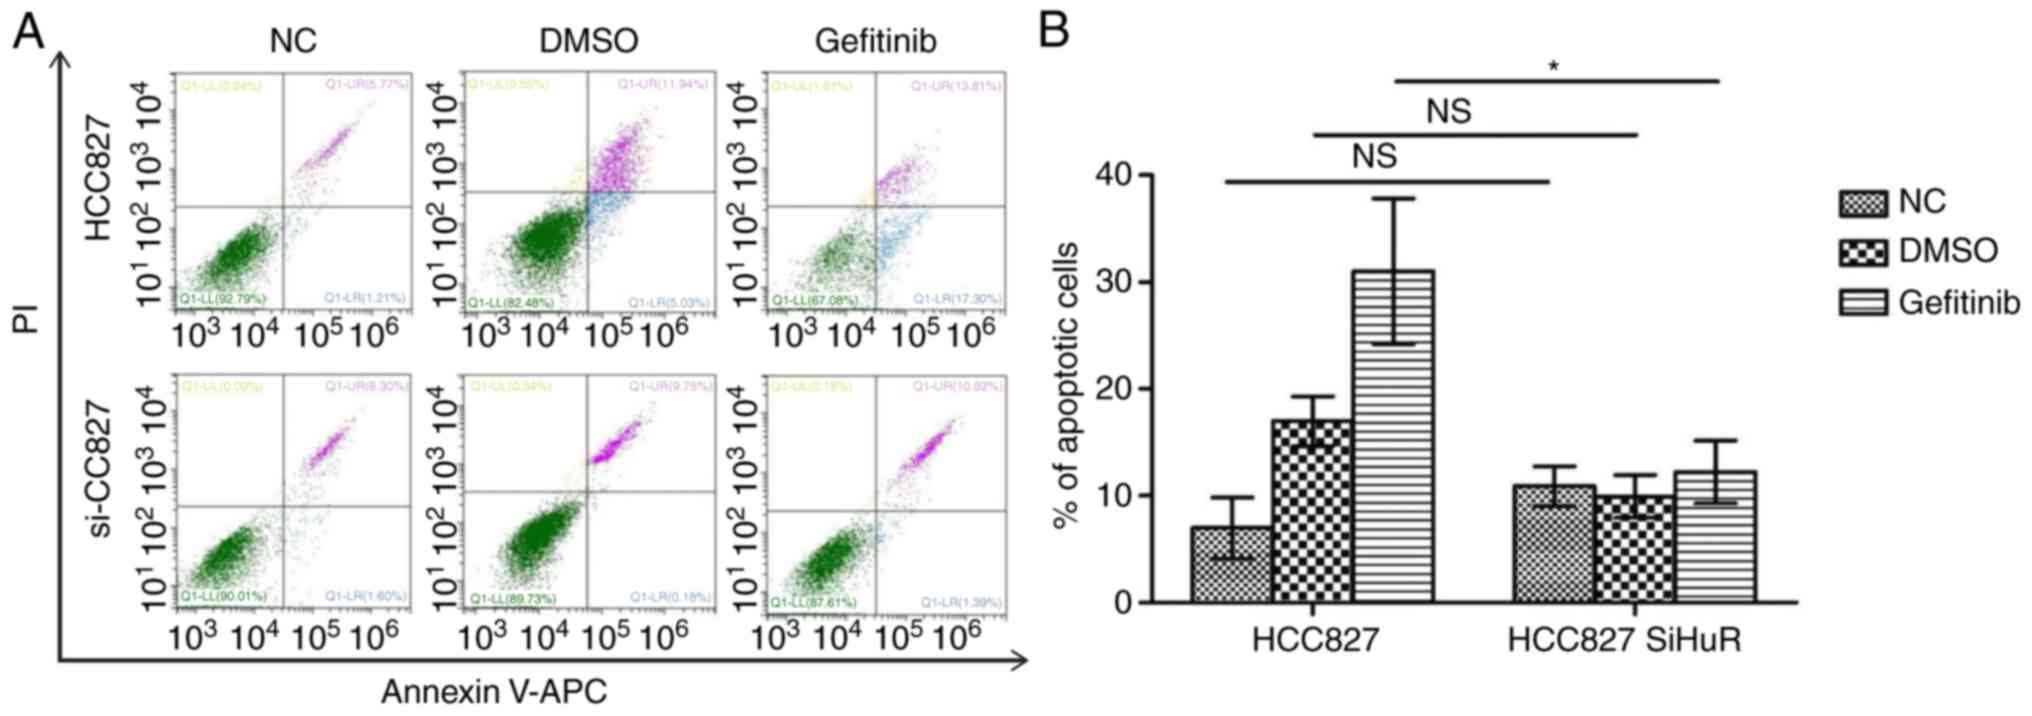 Decreased human antigen R expression confers resistance to tyrosine